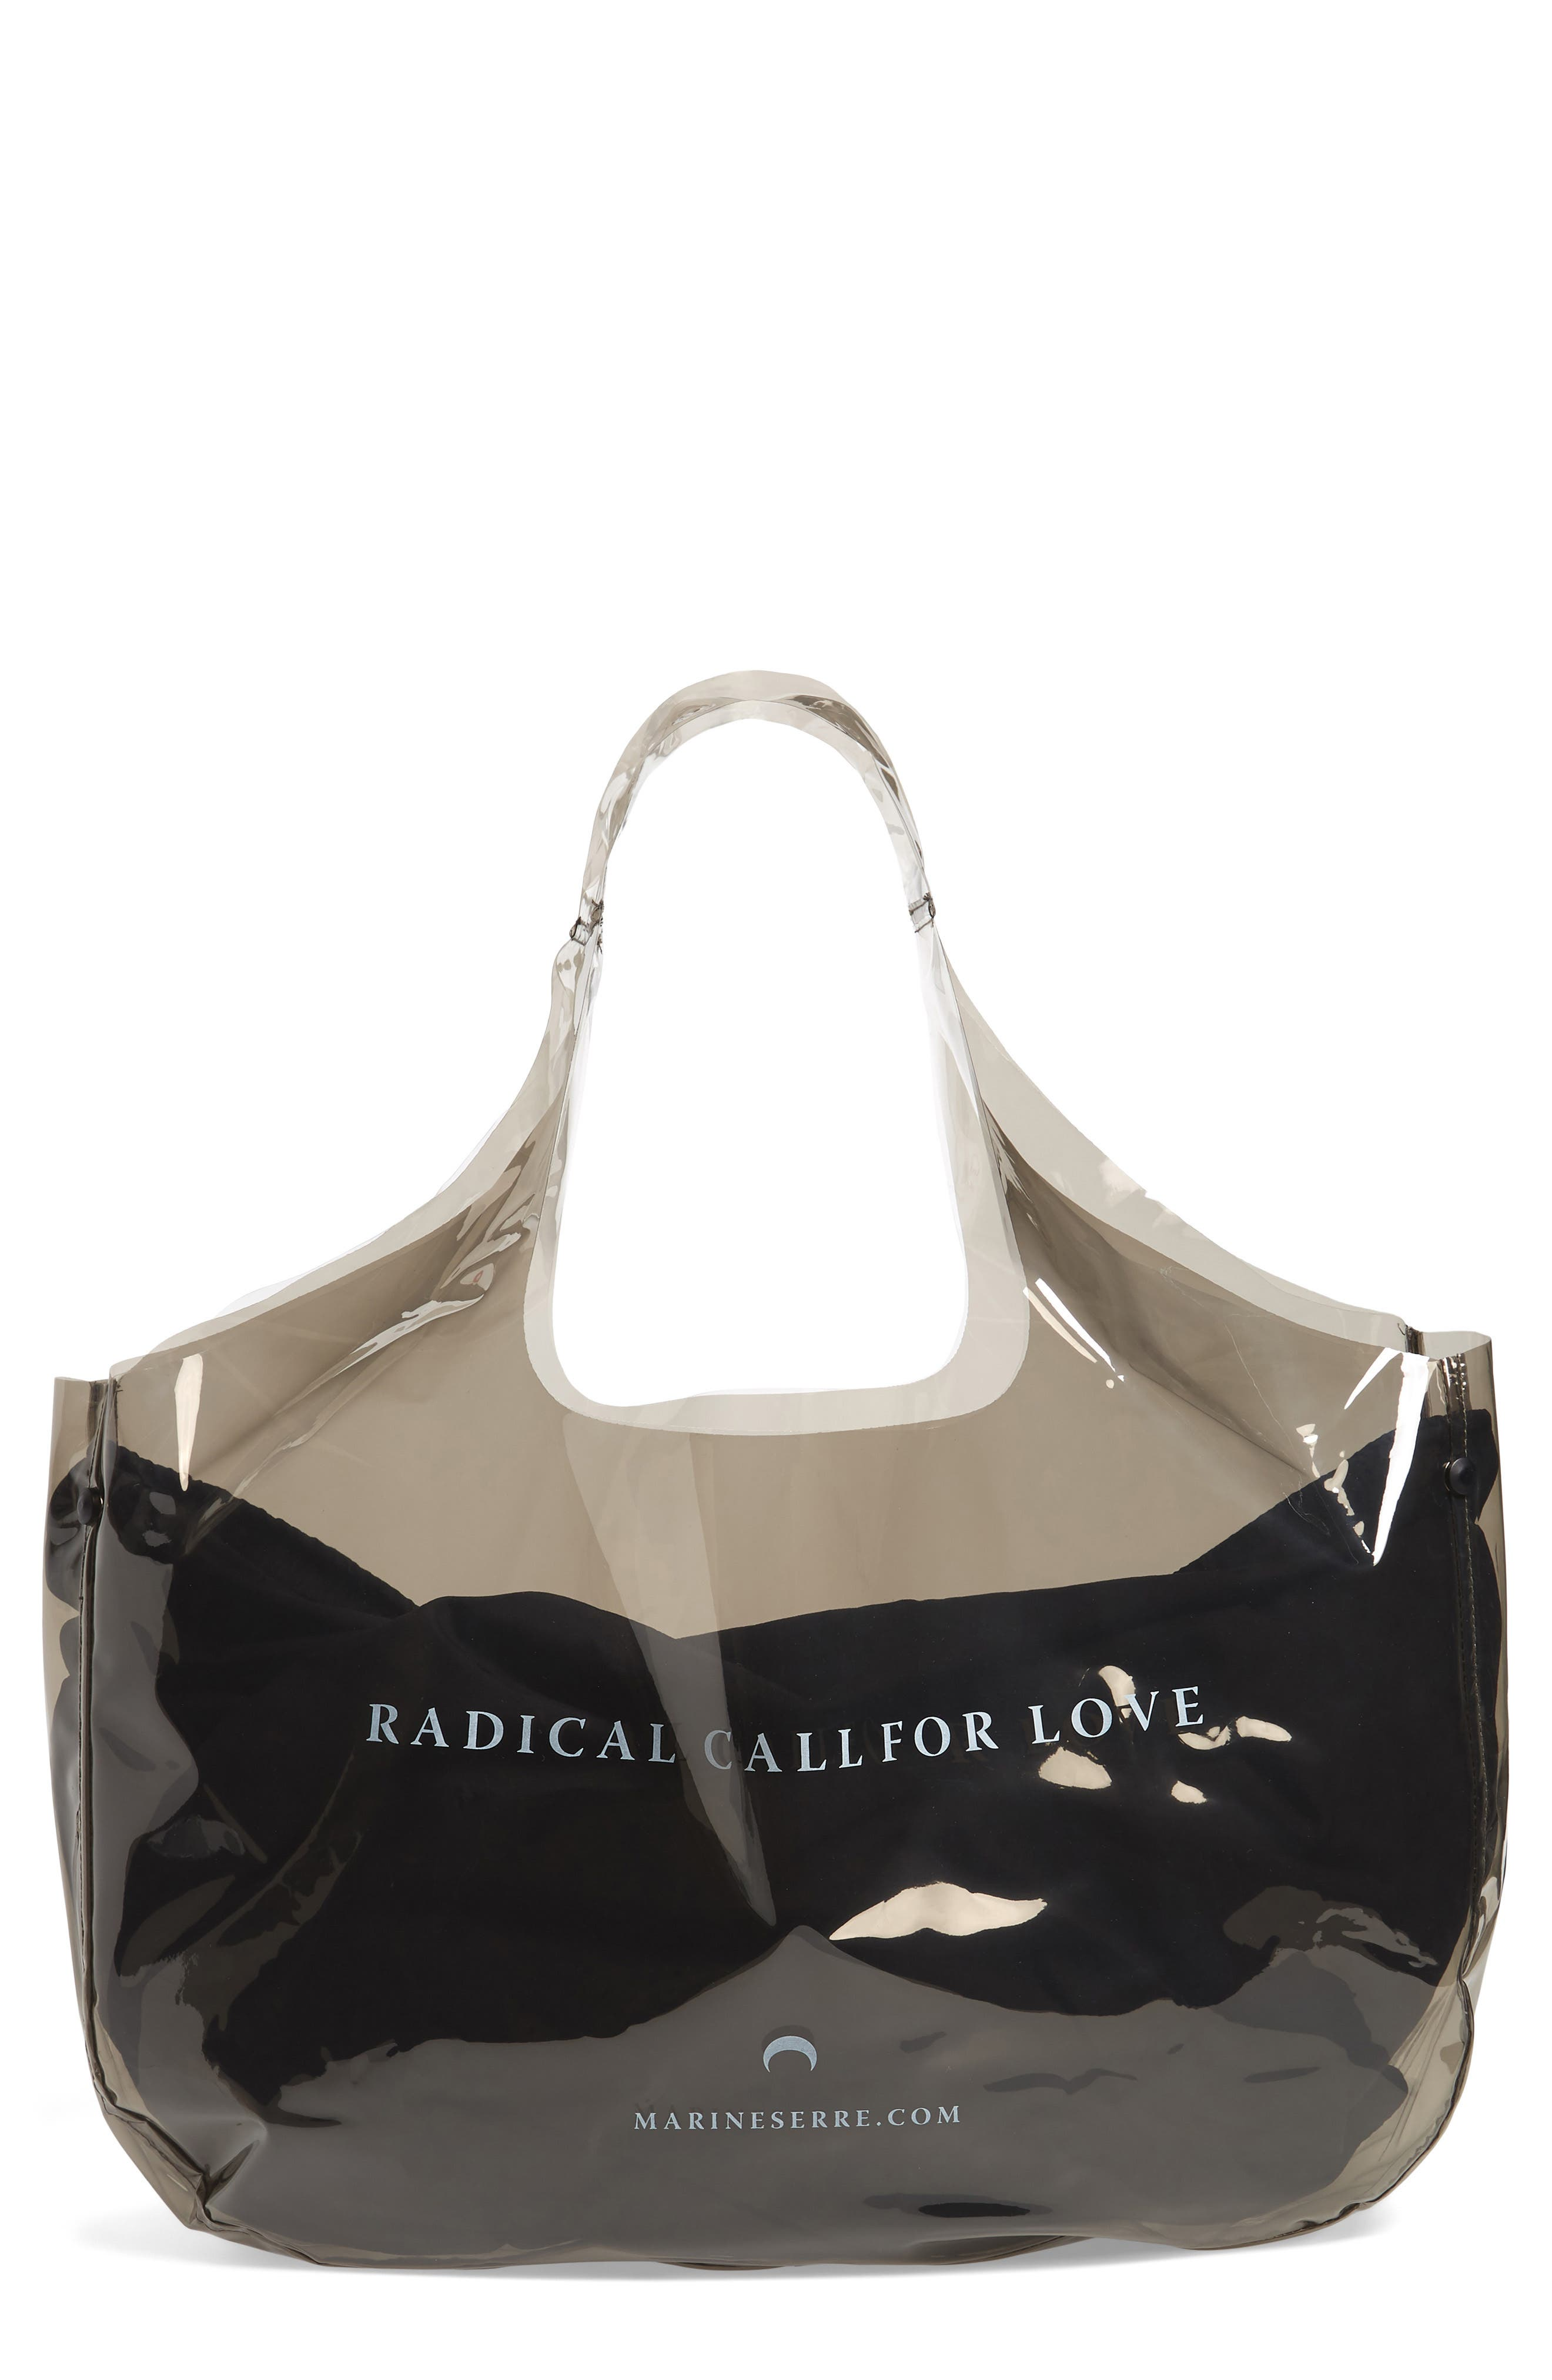 Marine Serre Radical Call for Love Transparent Shopping Bag